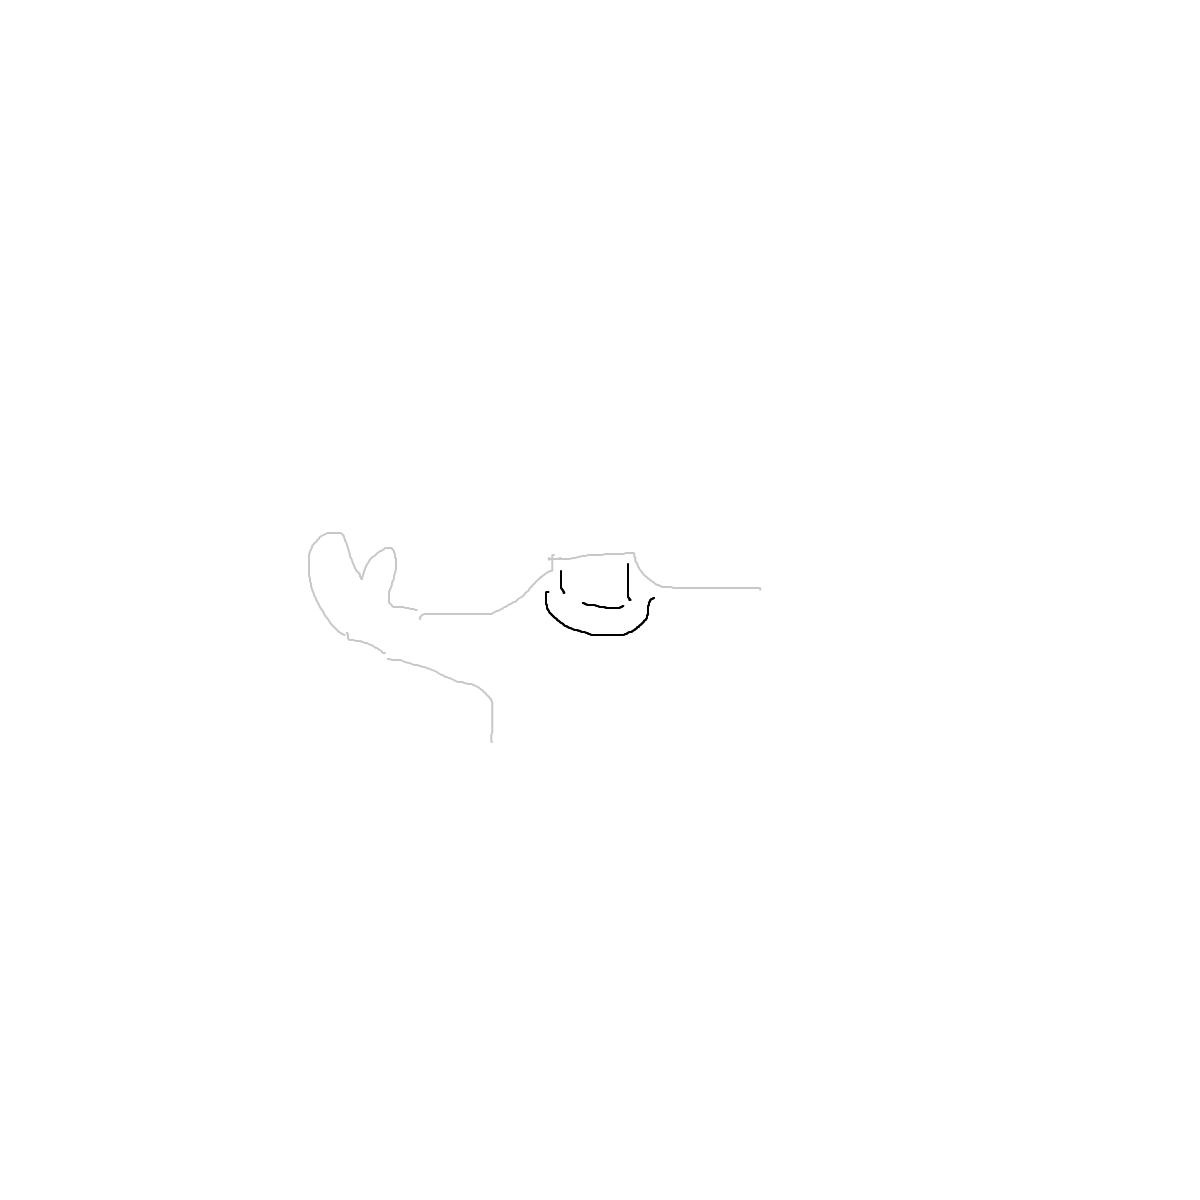 BAAAM drawing#5249 lat:39.9655952453613300lng: -75.1809158325195300